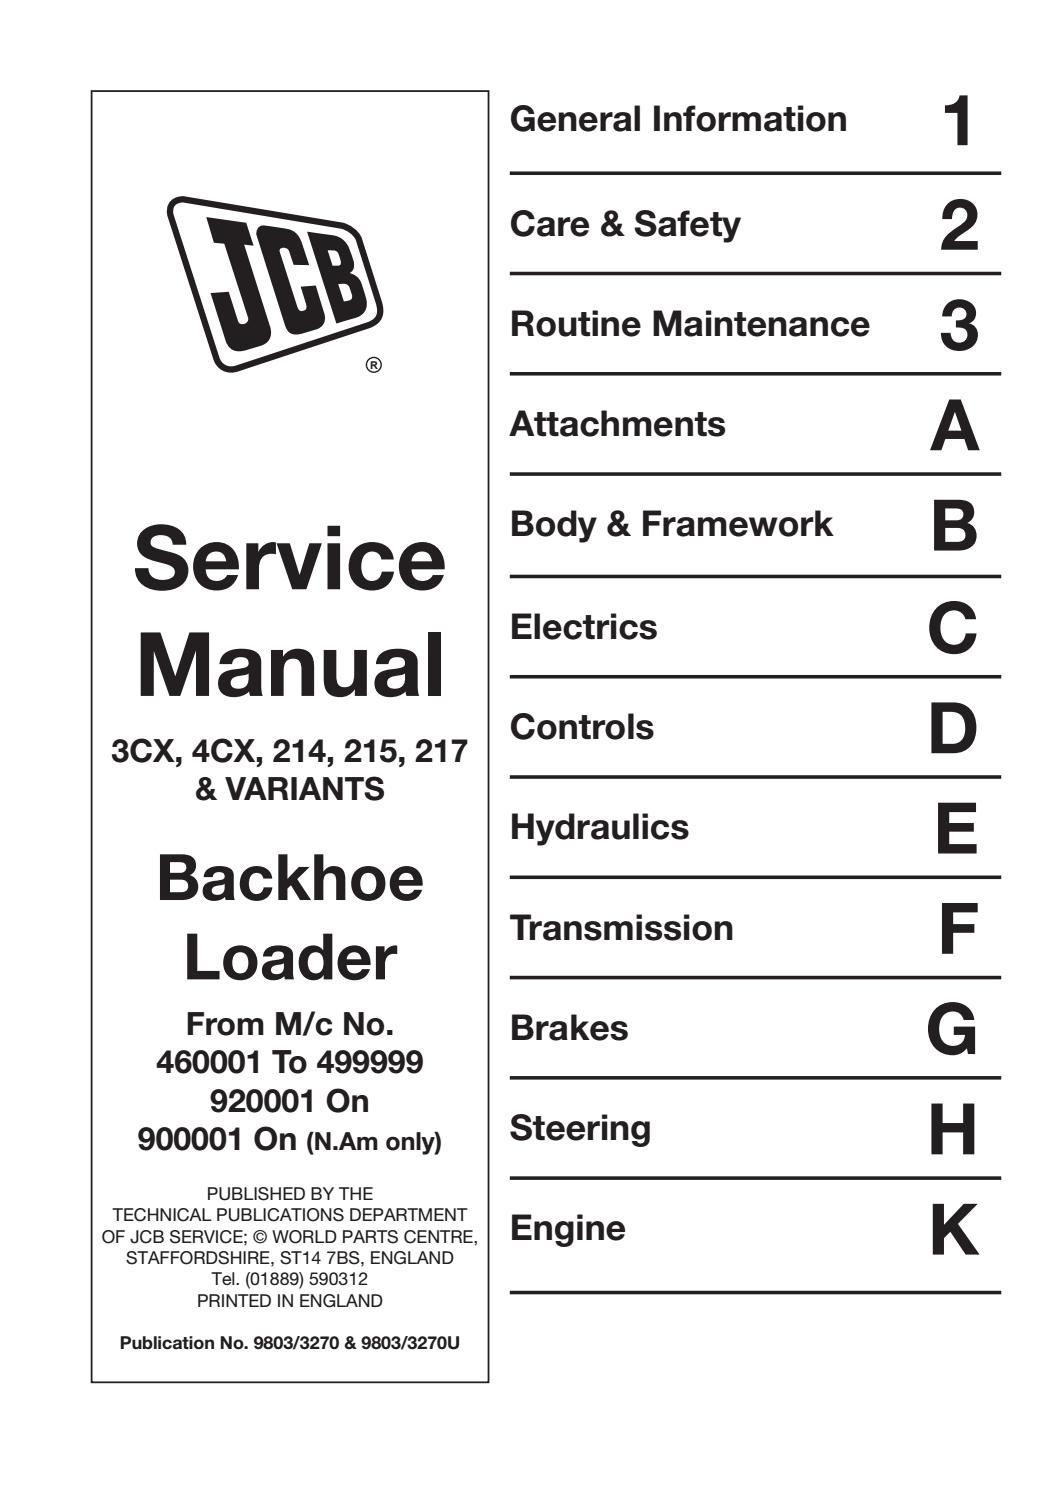 jcb 3cx 4cx backhoe loader workshop service repair manual